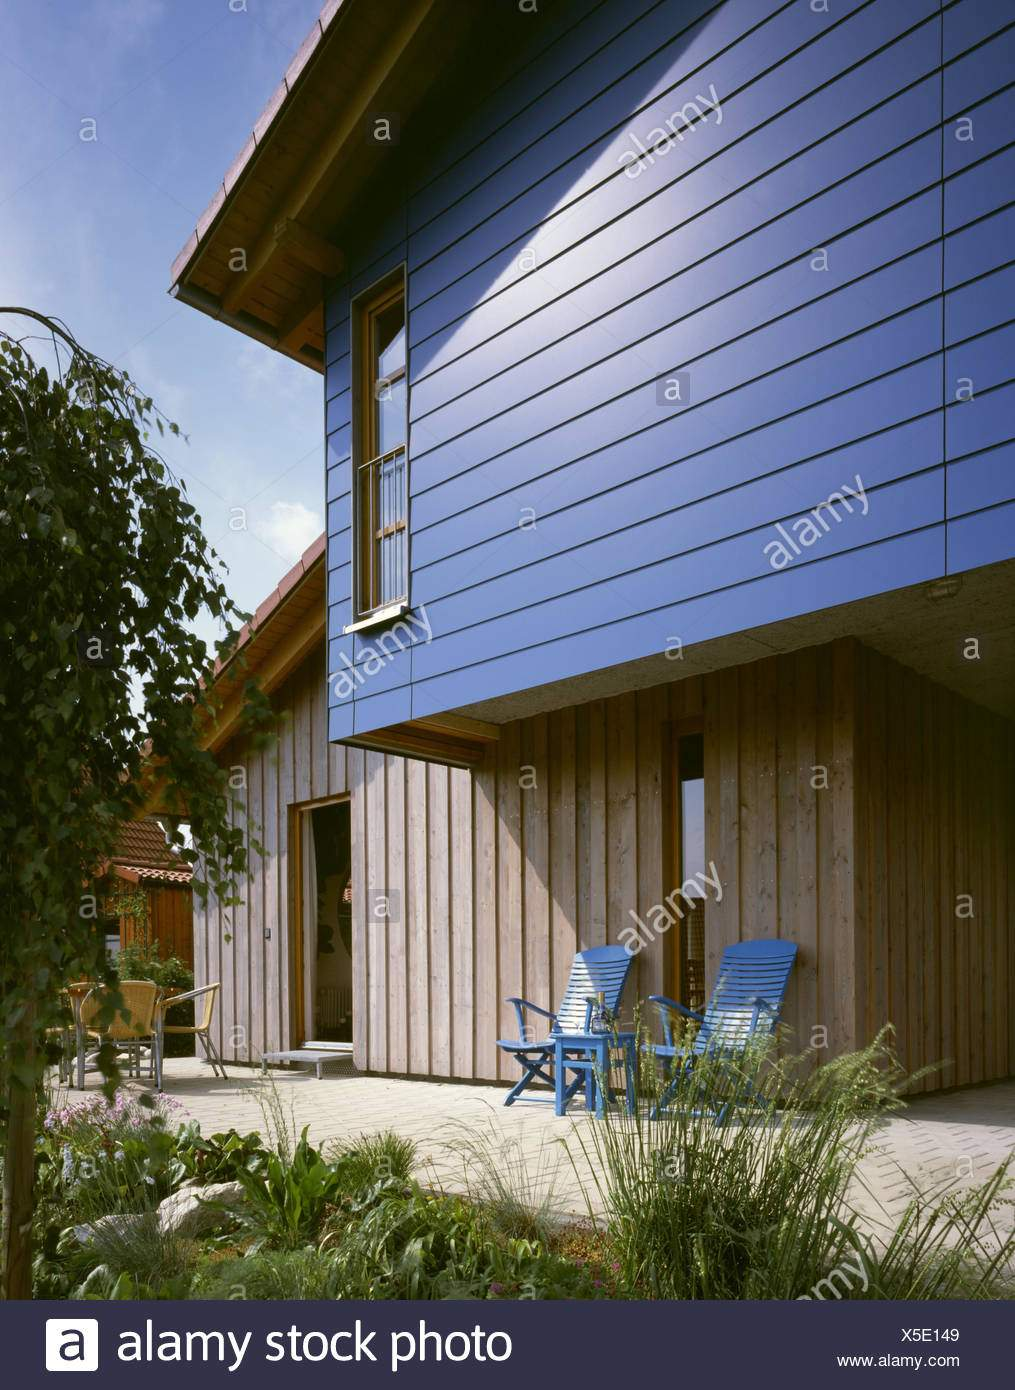 holzhaus detail fassade blau terrasse stuhle holzwand x5e149